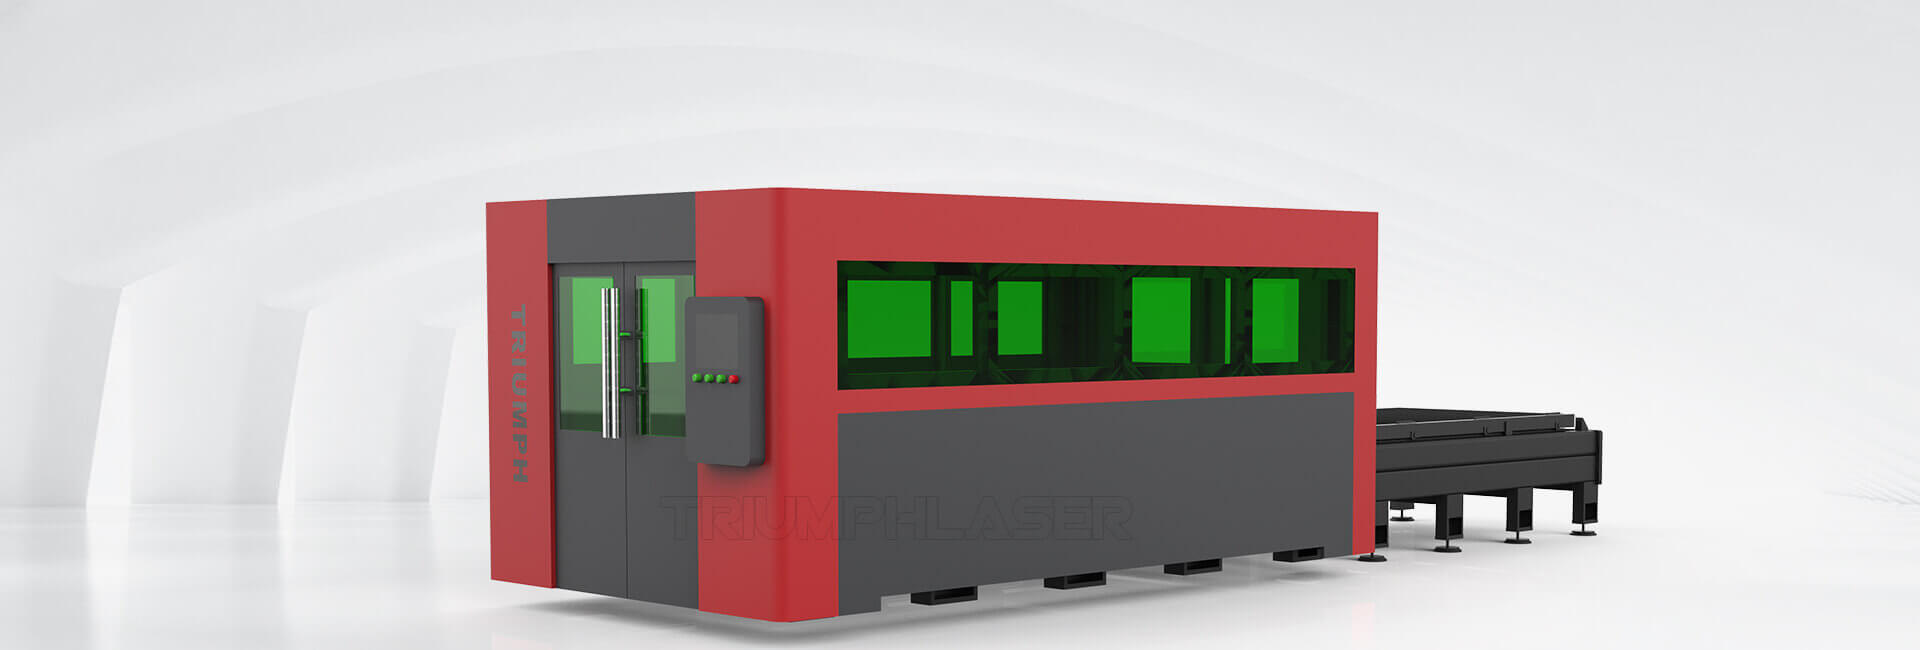 Encolesd fiber laser cutting machine